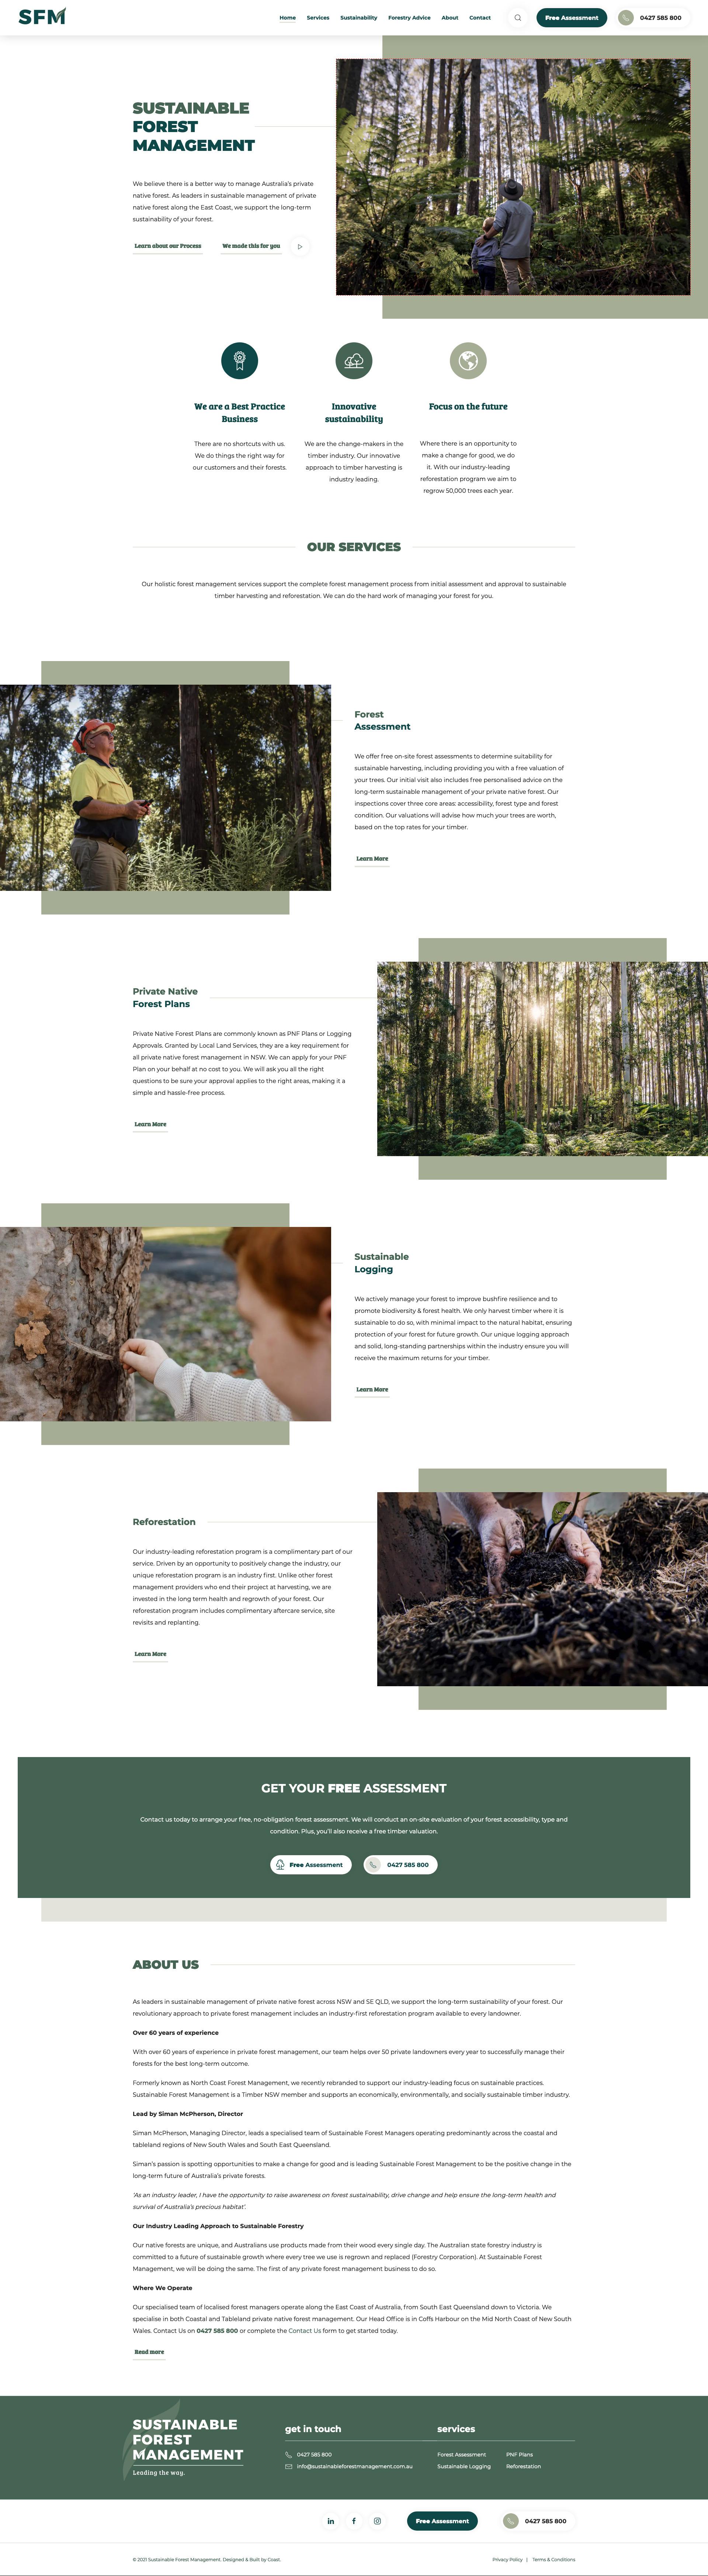 Website Design & Development for Sustainable Forest Management